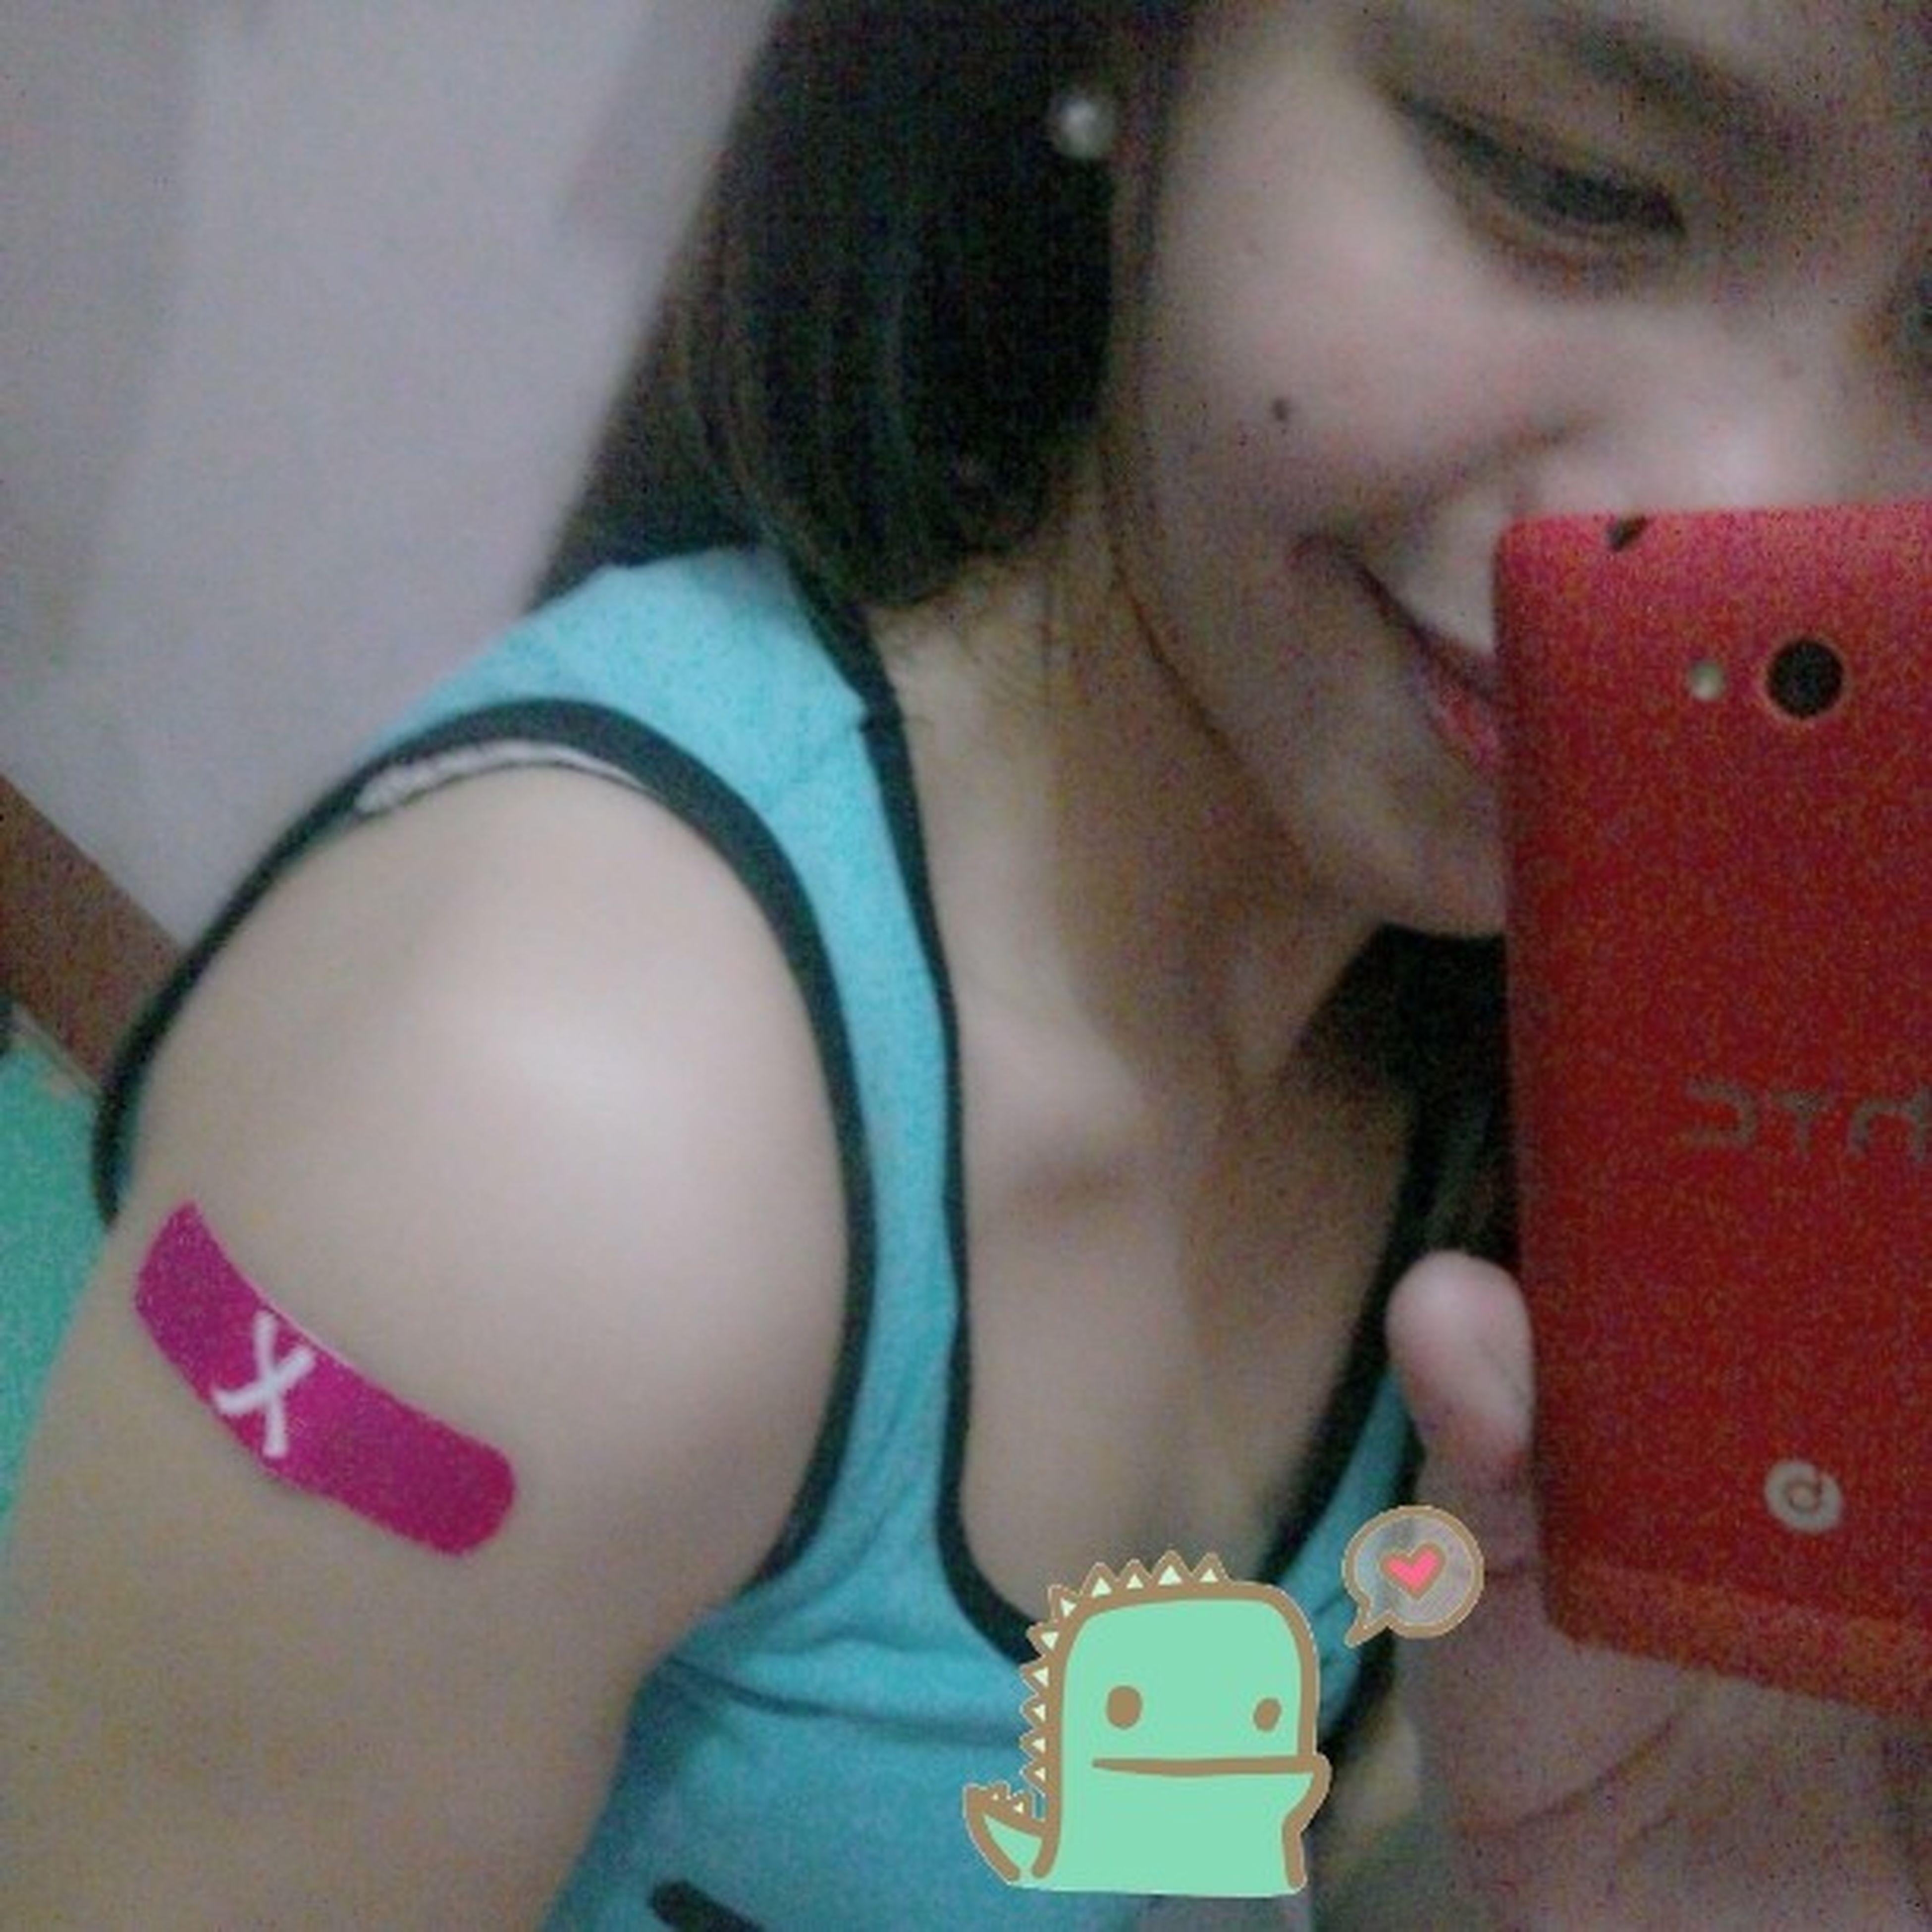 Protected. Healthiswealth Fluvac Cervarix